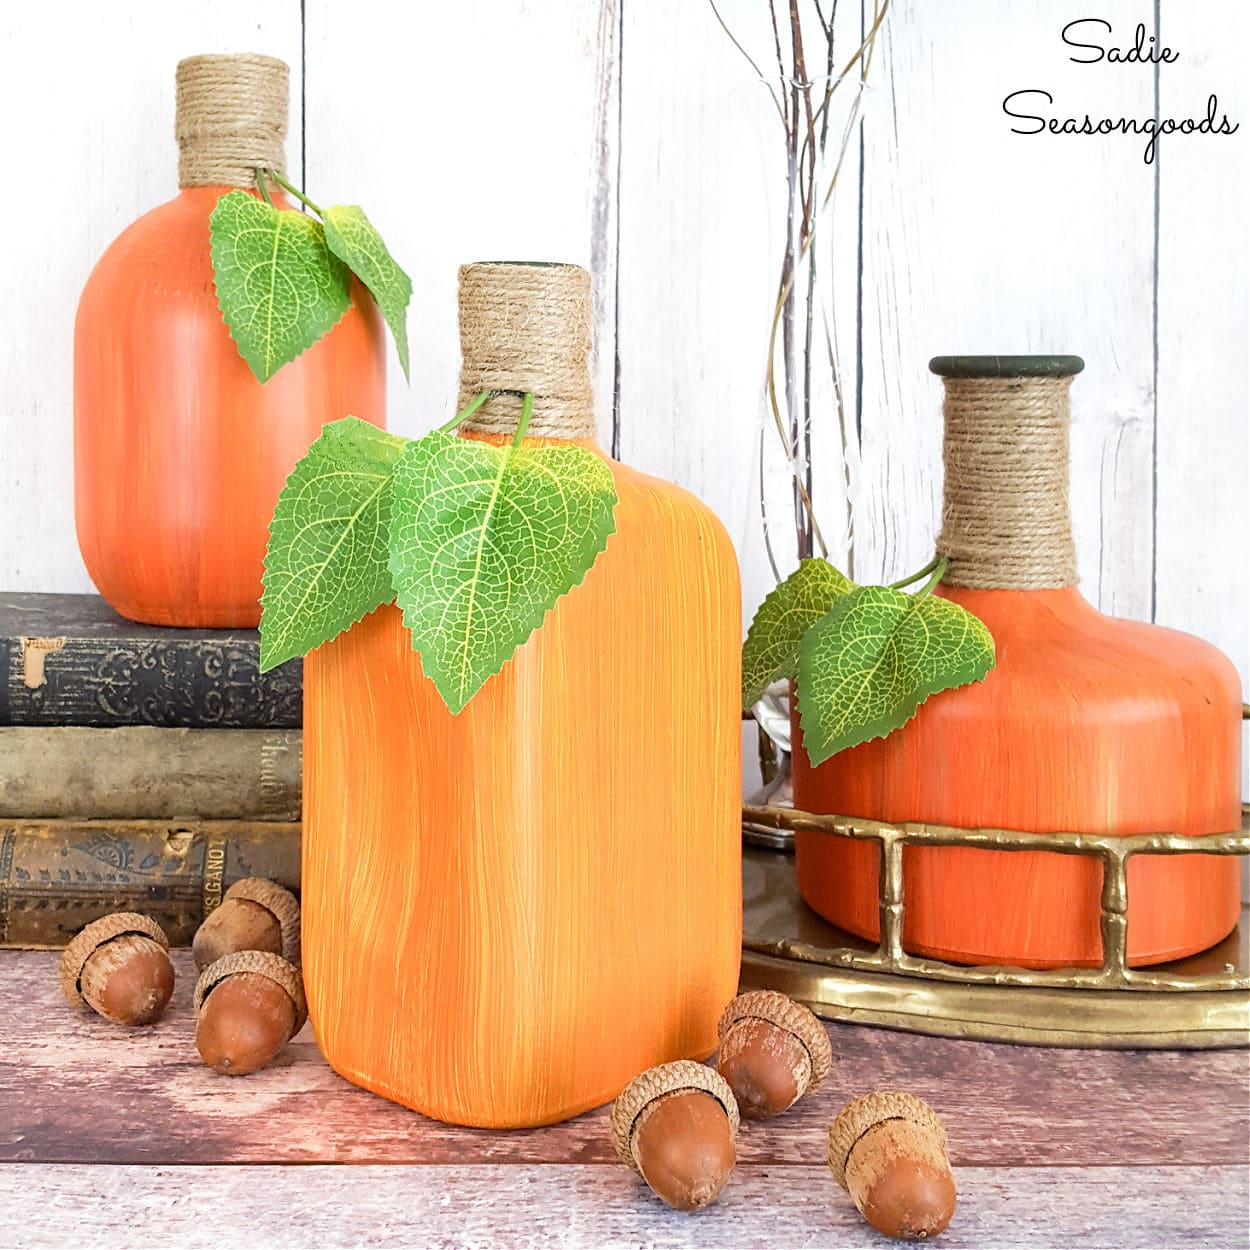 Liquor Bottle Painting for Fall Pumpkin Decor